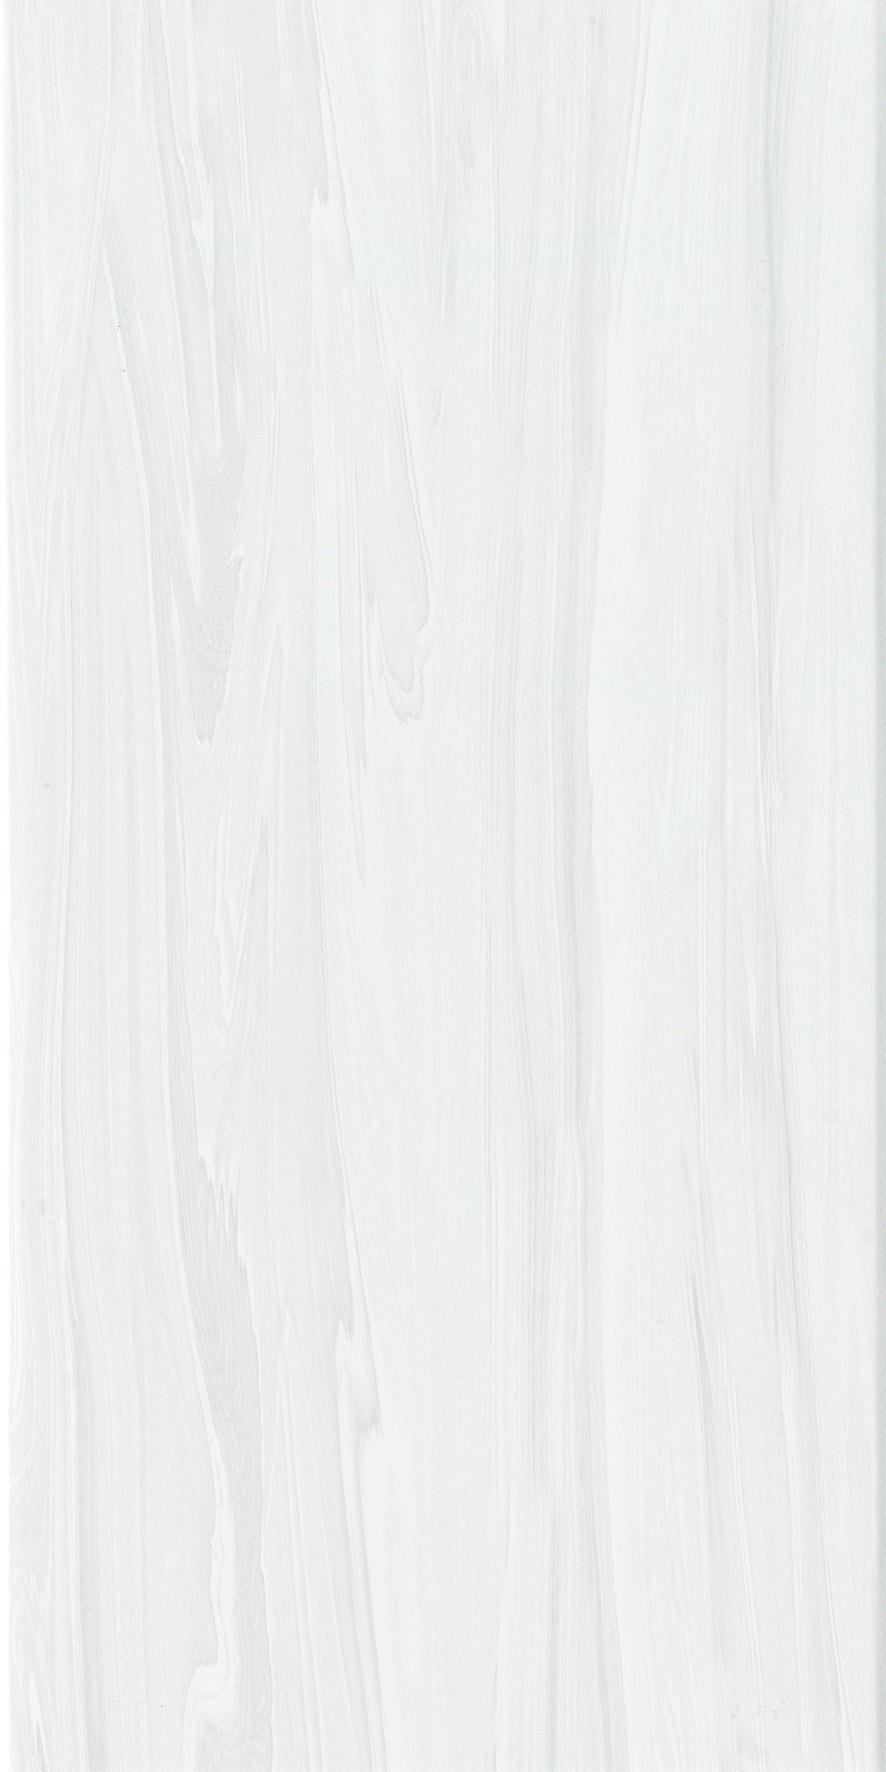 2-3E60552、3E60553(600x300mm)